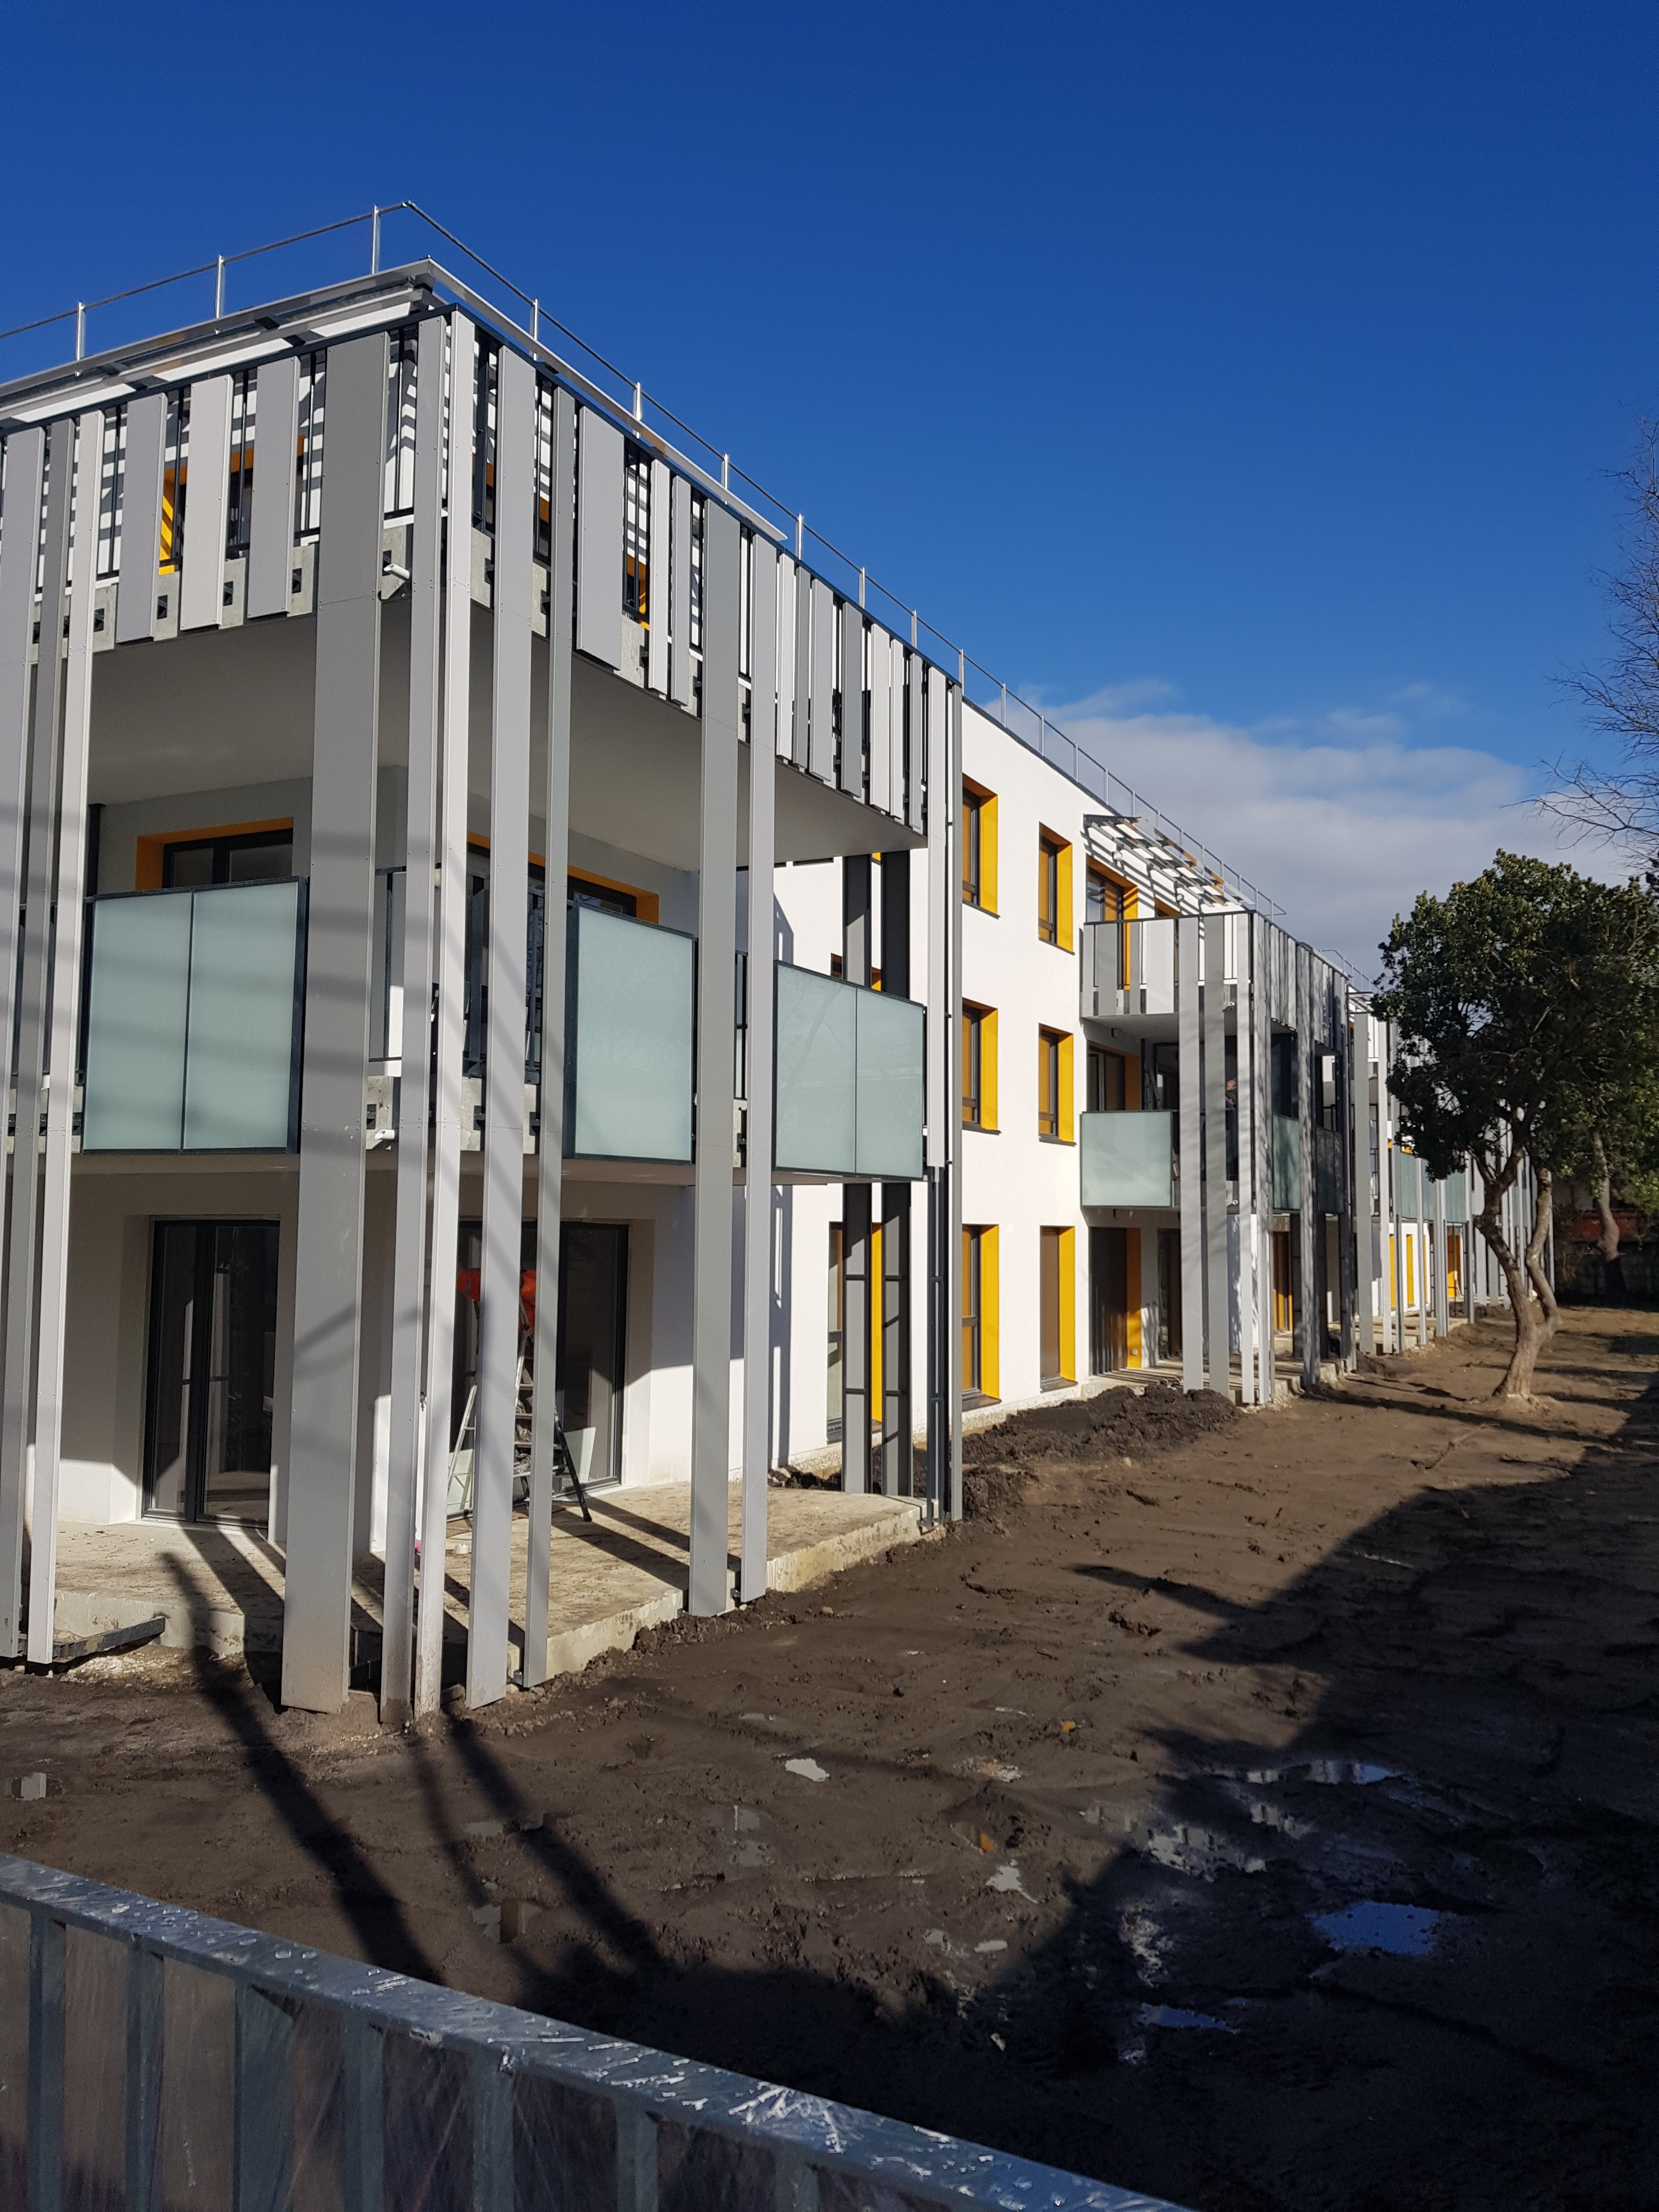 Residence l intemporelle neuf b2ix opc moe bordeaux for Residence neuf